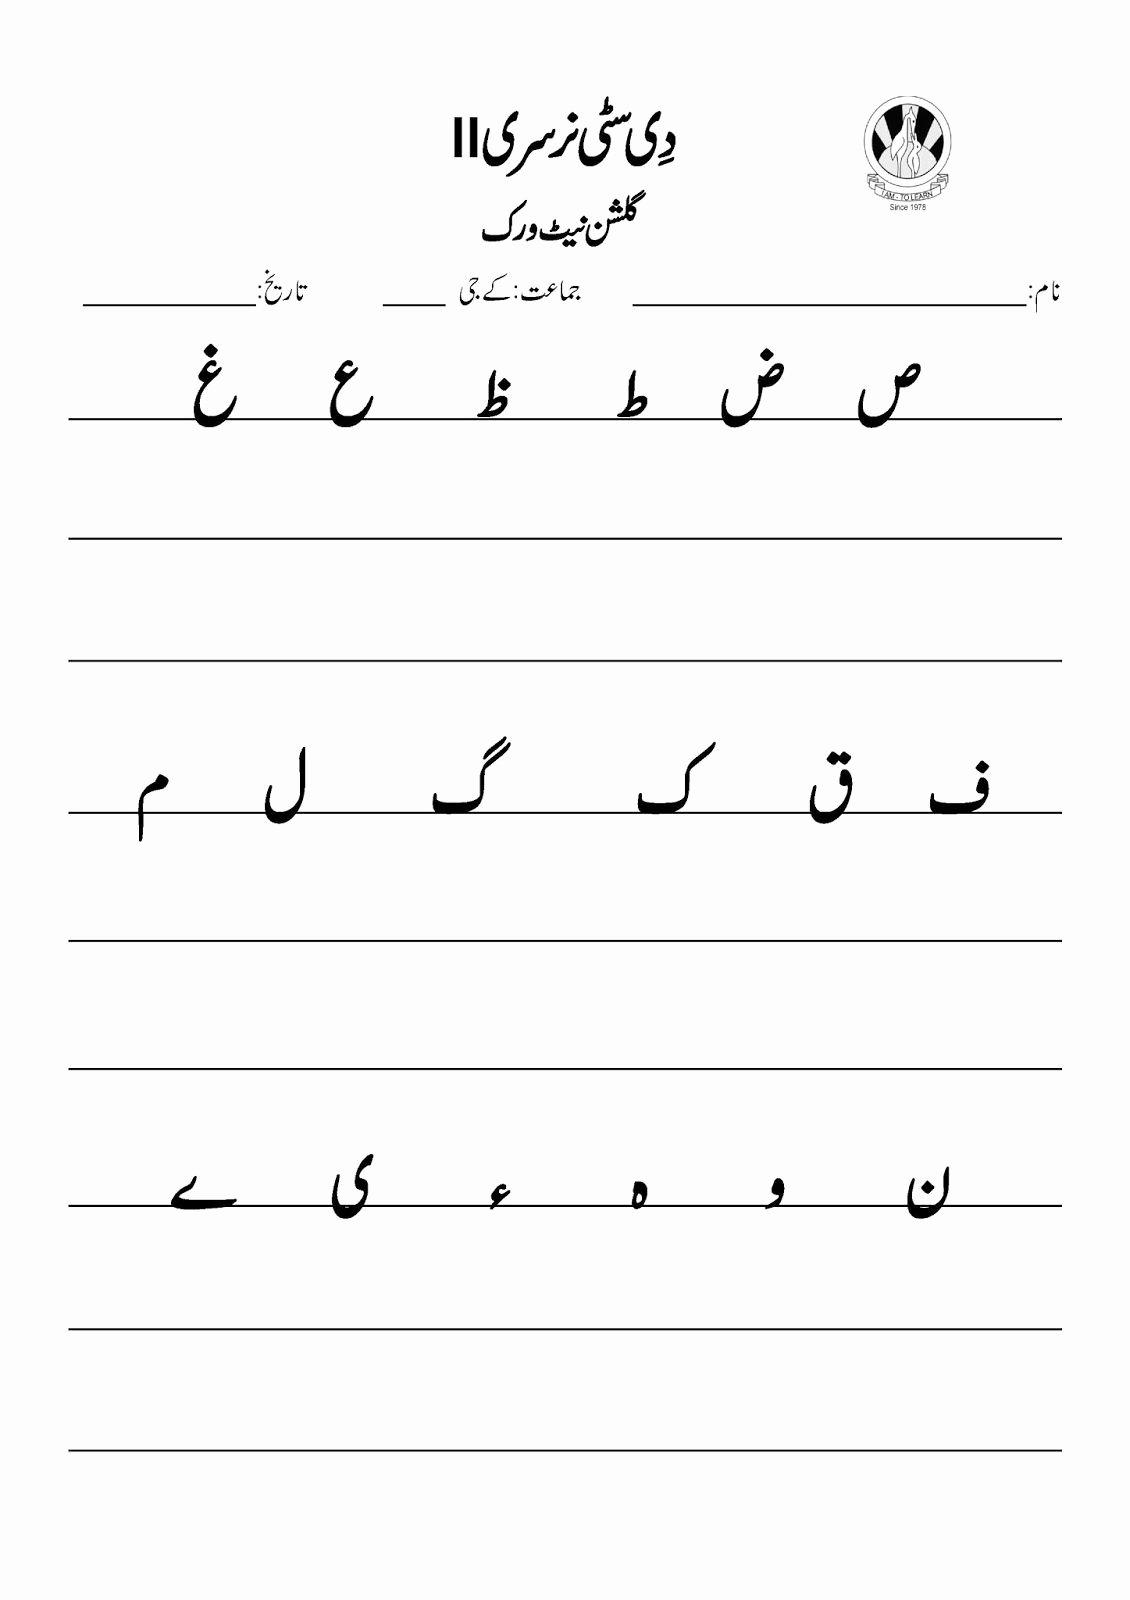 Urdu Worksheets for Preschoolers Inspirational Sr Gulshan the City Nursery Ii Urdu First Term